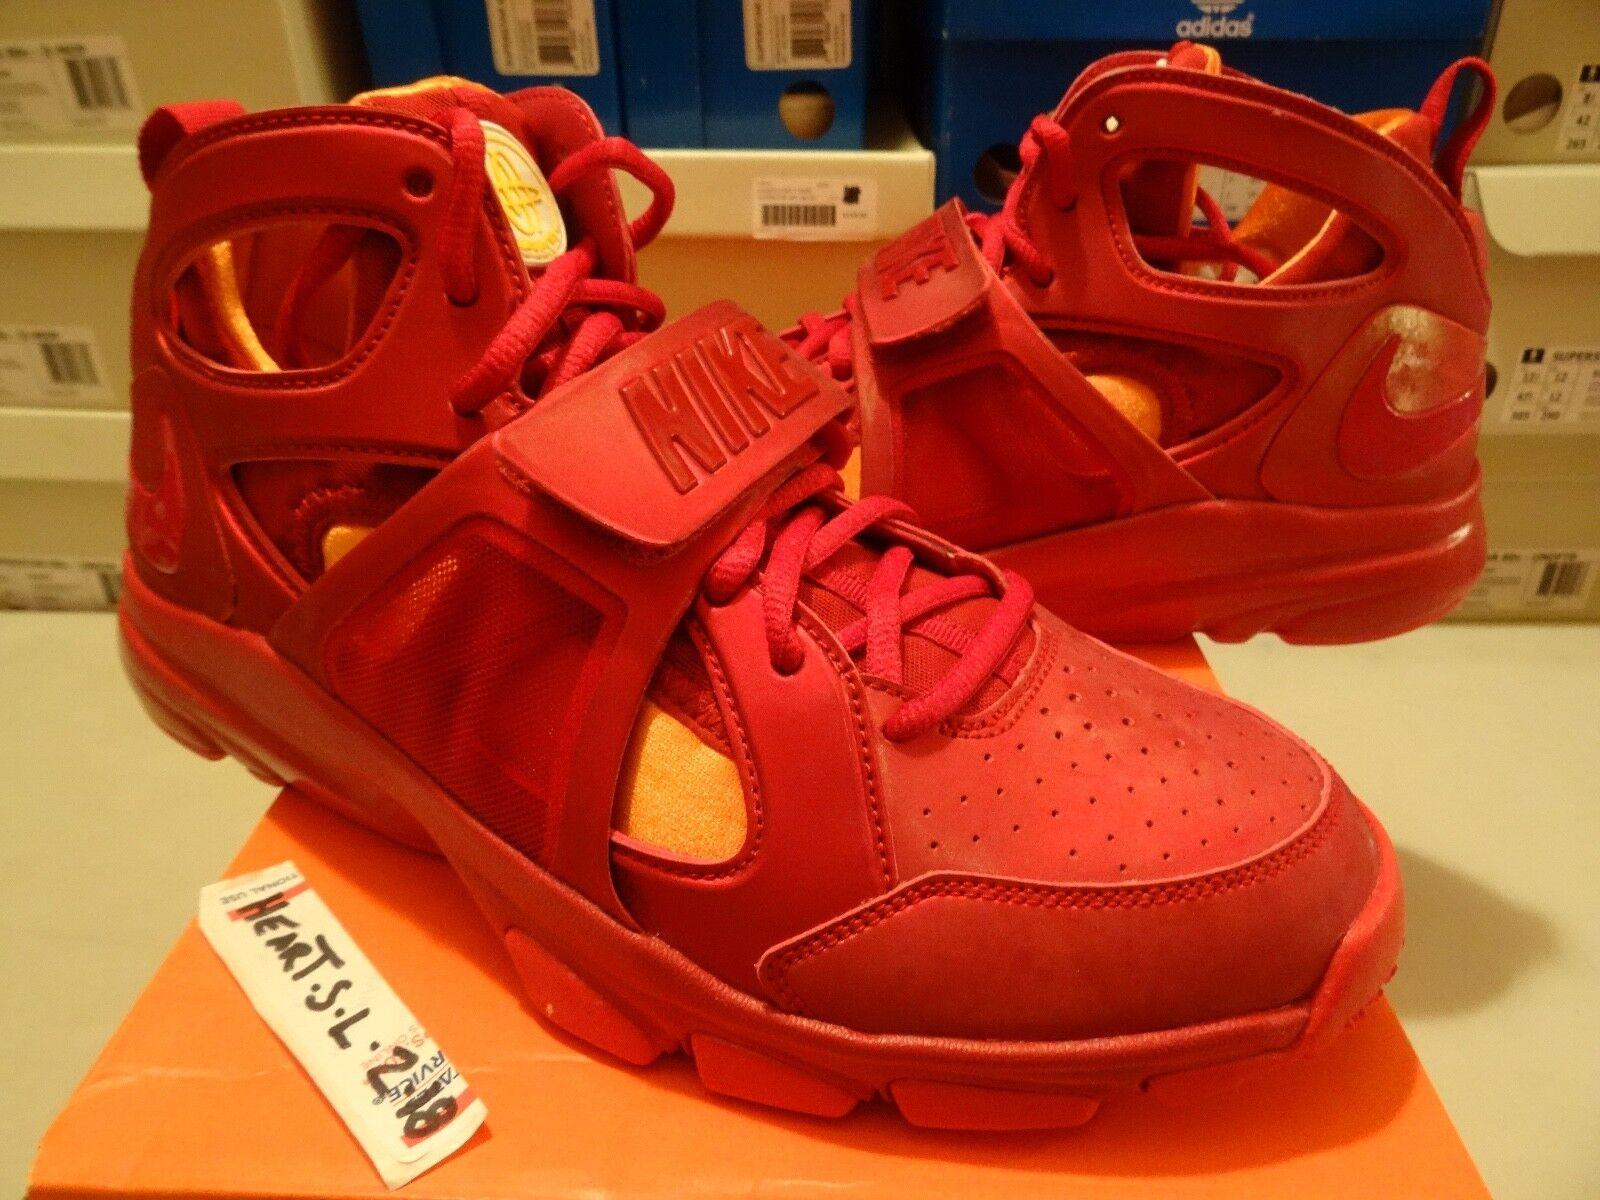 NEW Nike AIR MAX Zoom Huarache TR Mid Flash Varsity Red orange 414975 601 SZ 13